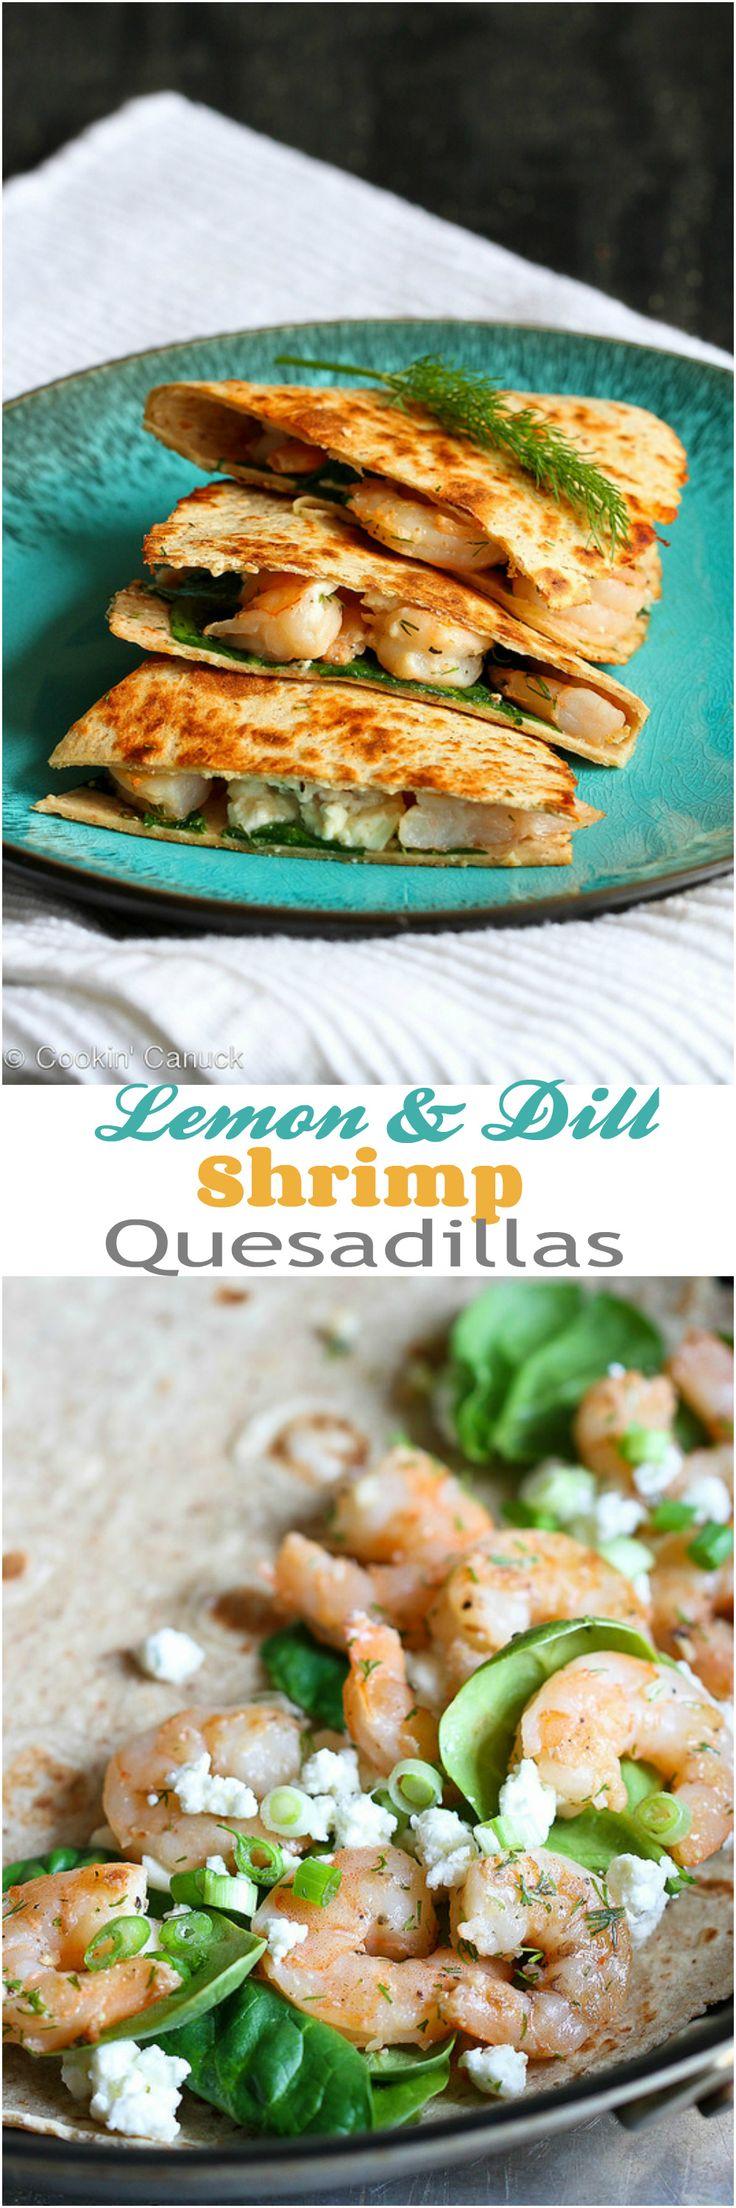 Lemon Dill Shrimp Quesadilla Recipe...257 calories and 6 Weight Watchers PP | cookincanuck.com #healthy